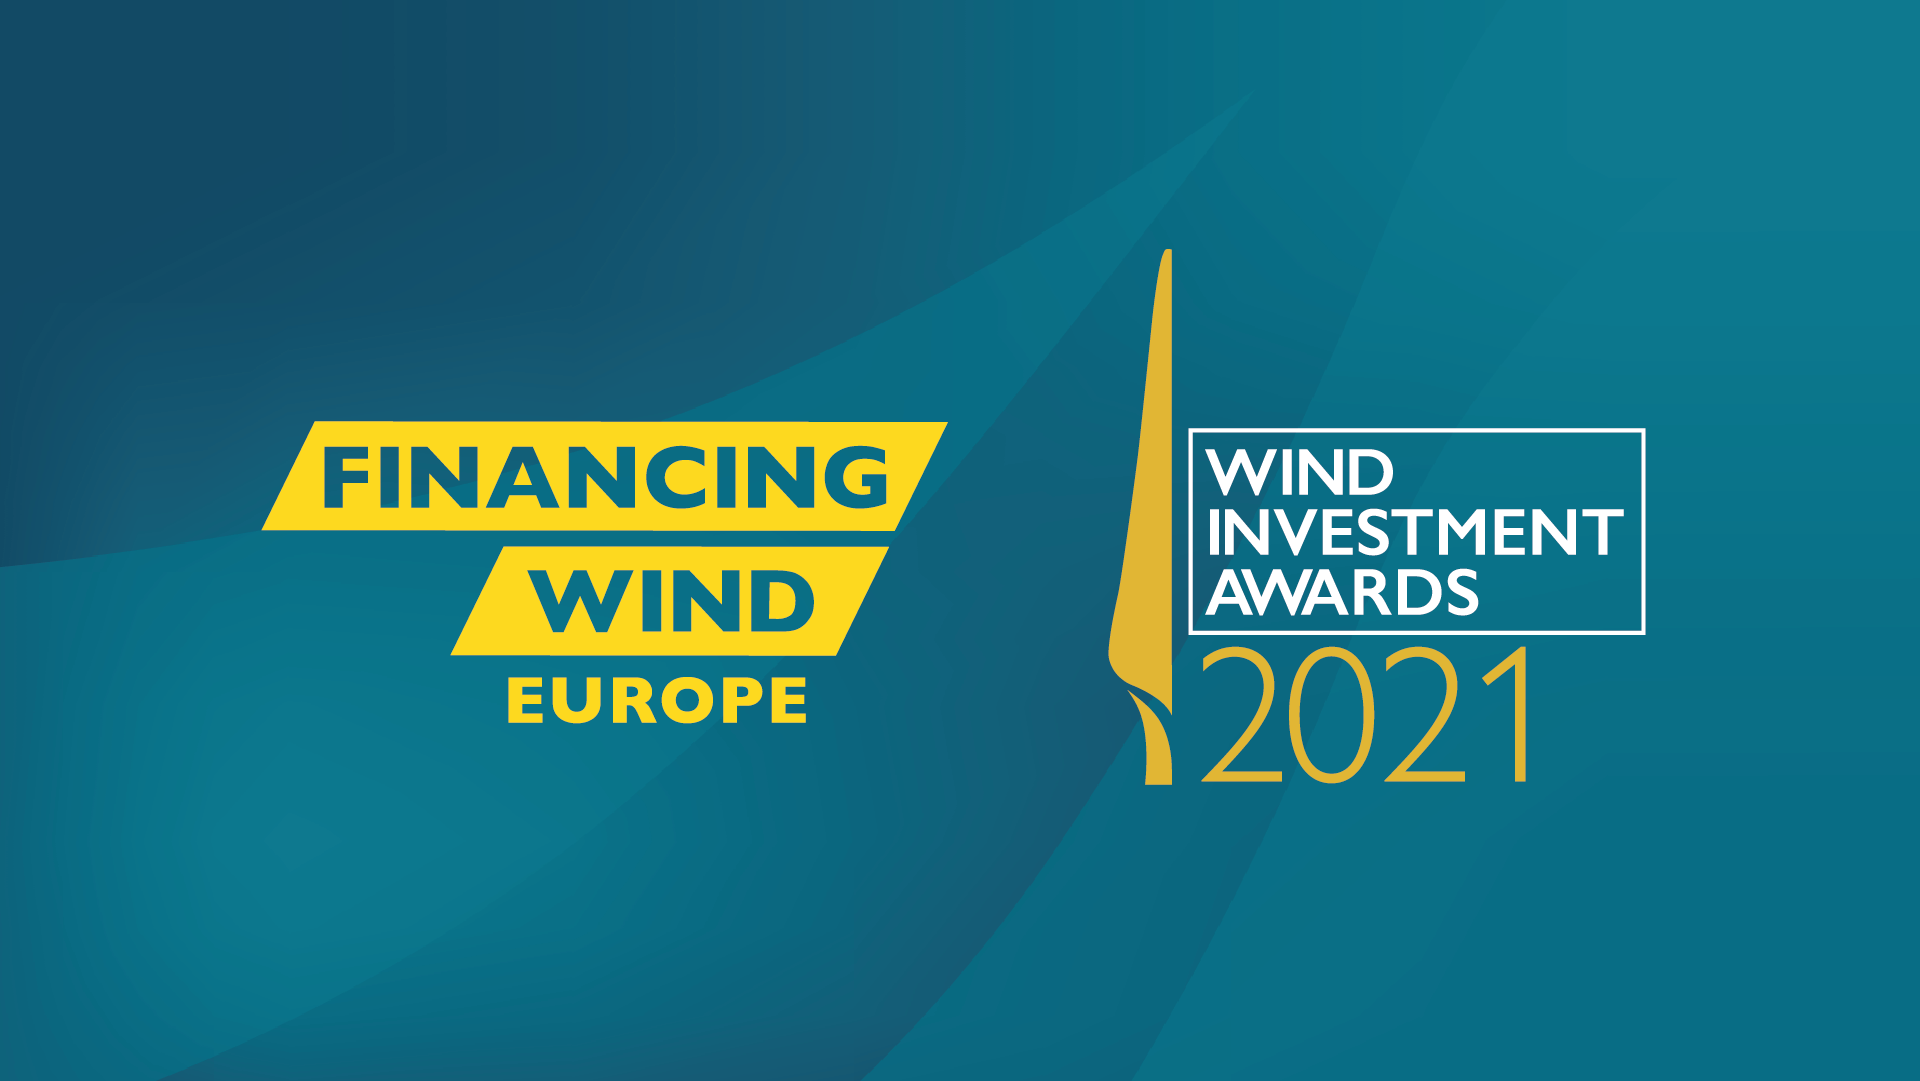 Financing Wind Europe 2021